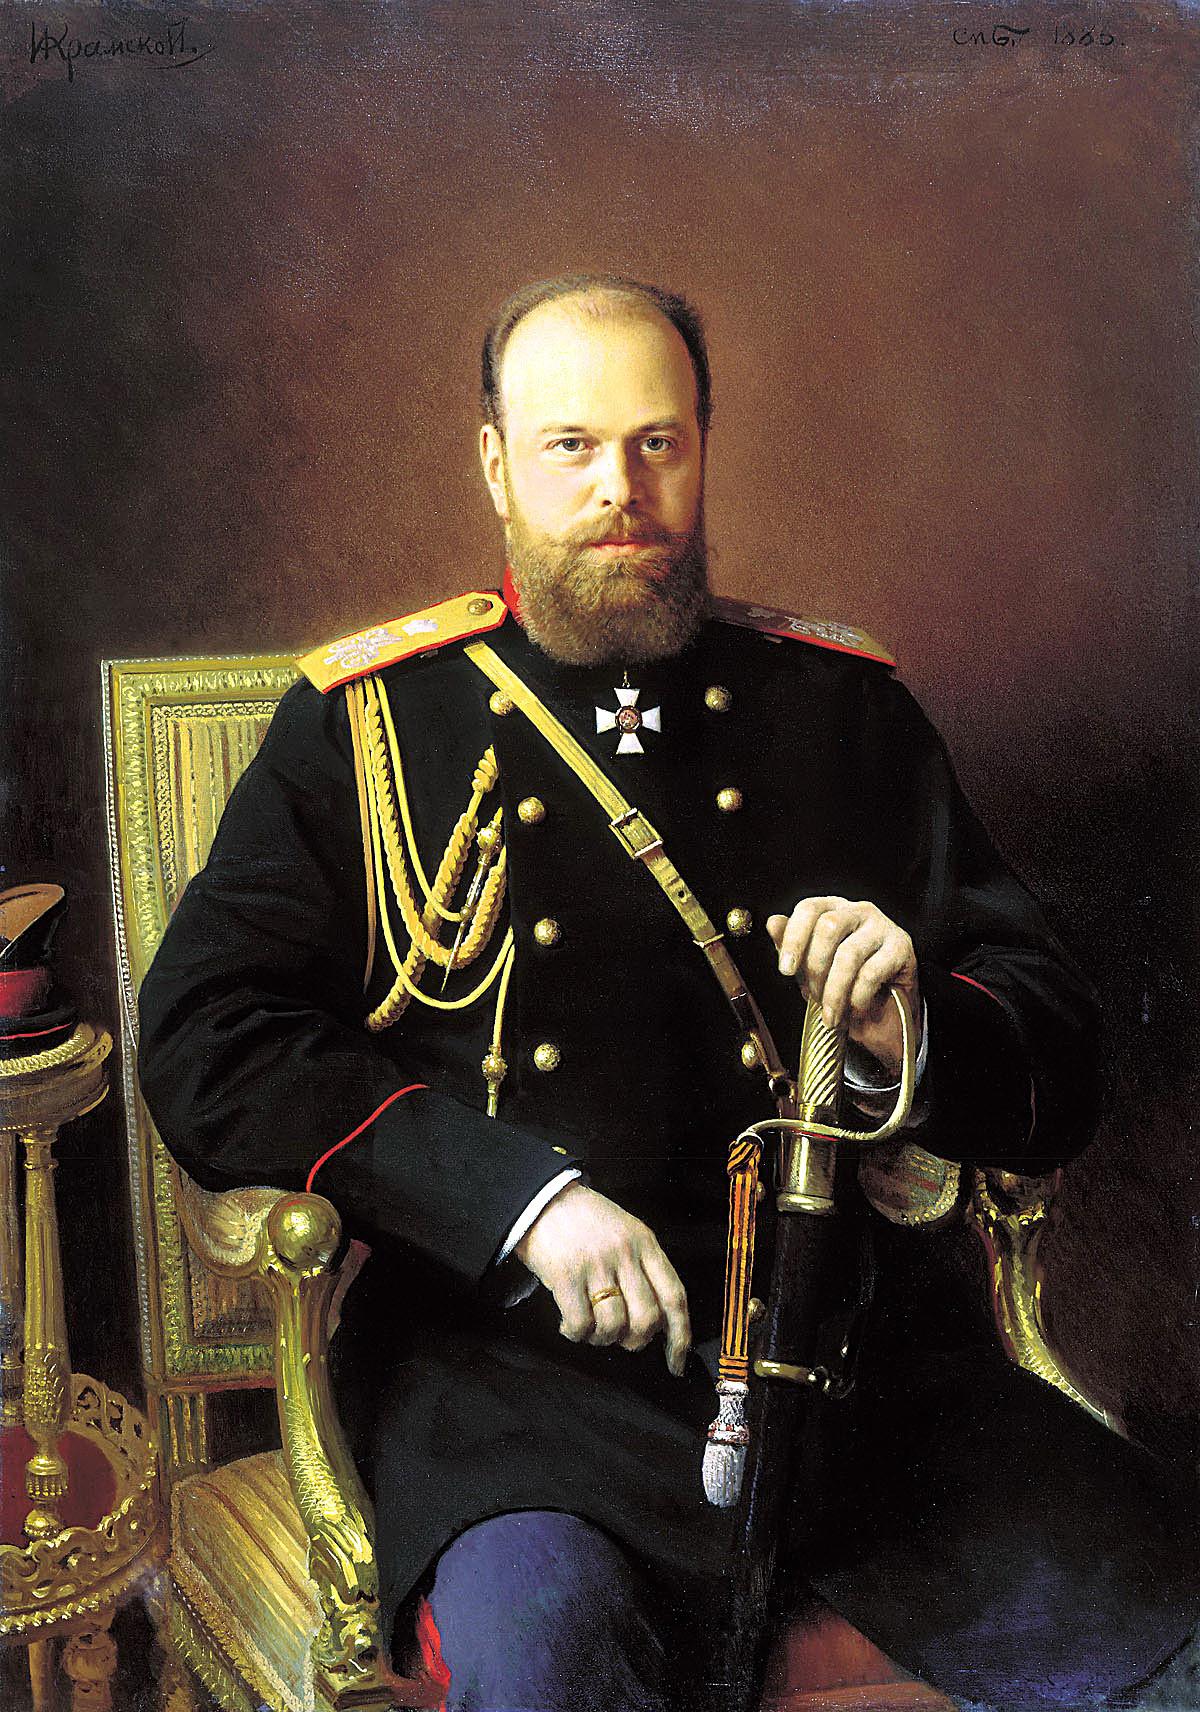 Portret ruskega carja Aleksandra III. (1845 - 1894), olje na platnu, I. N. Kramski.